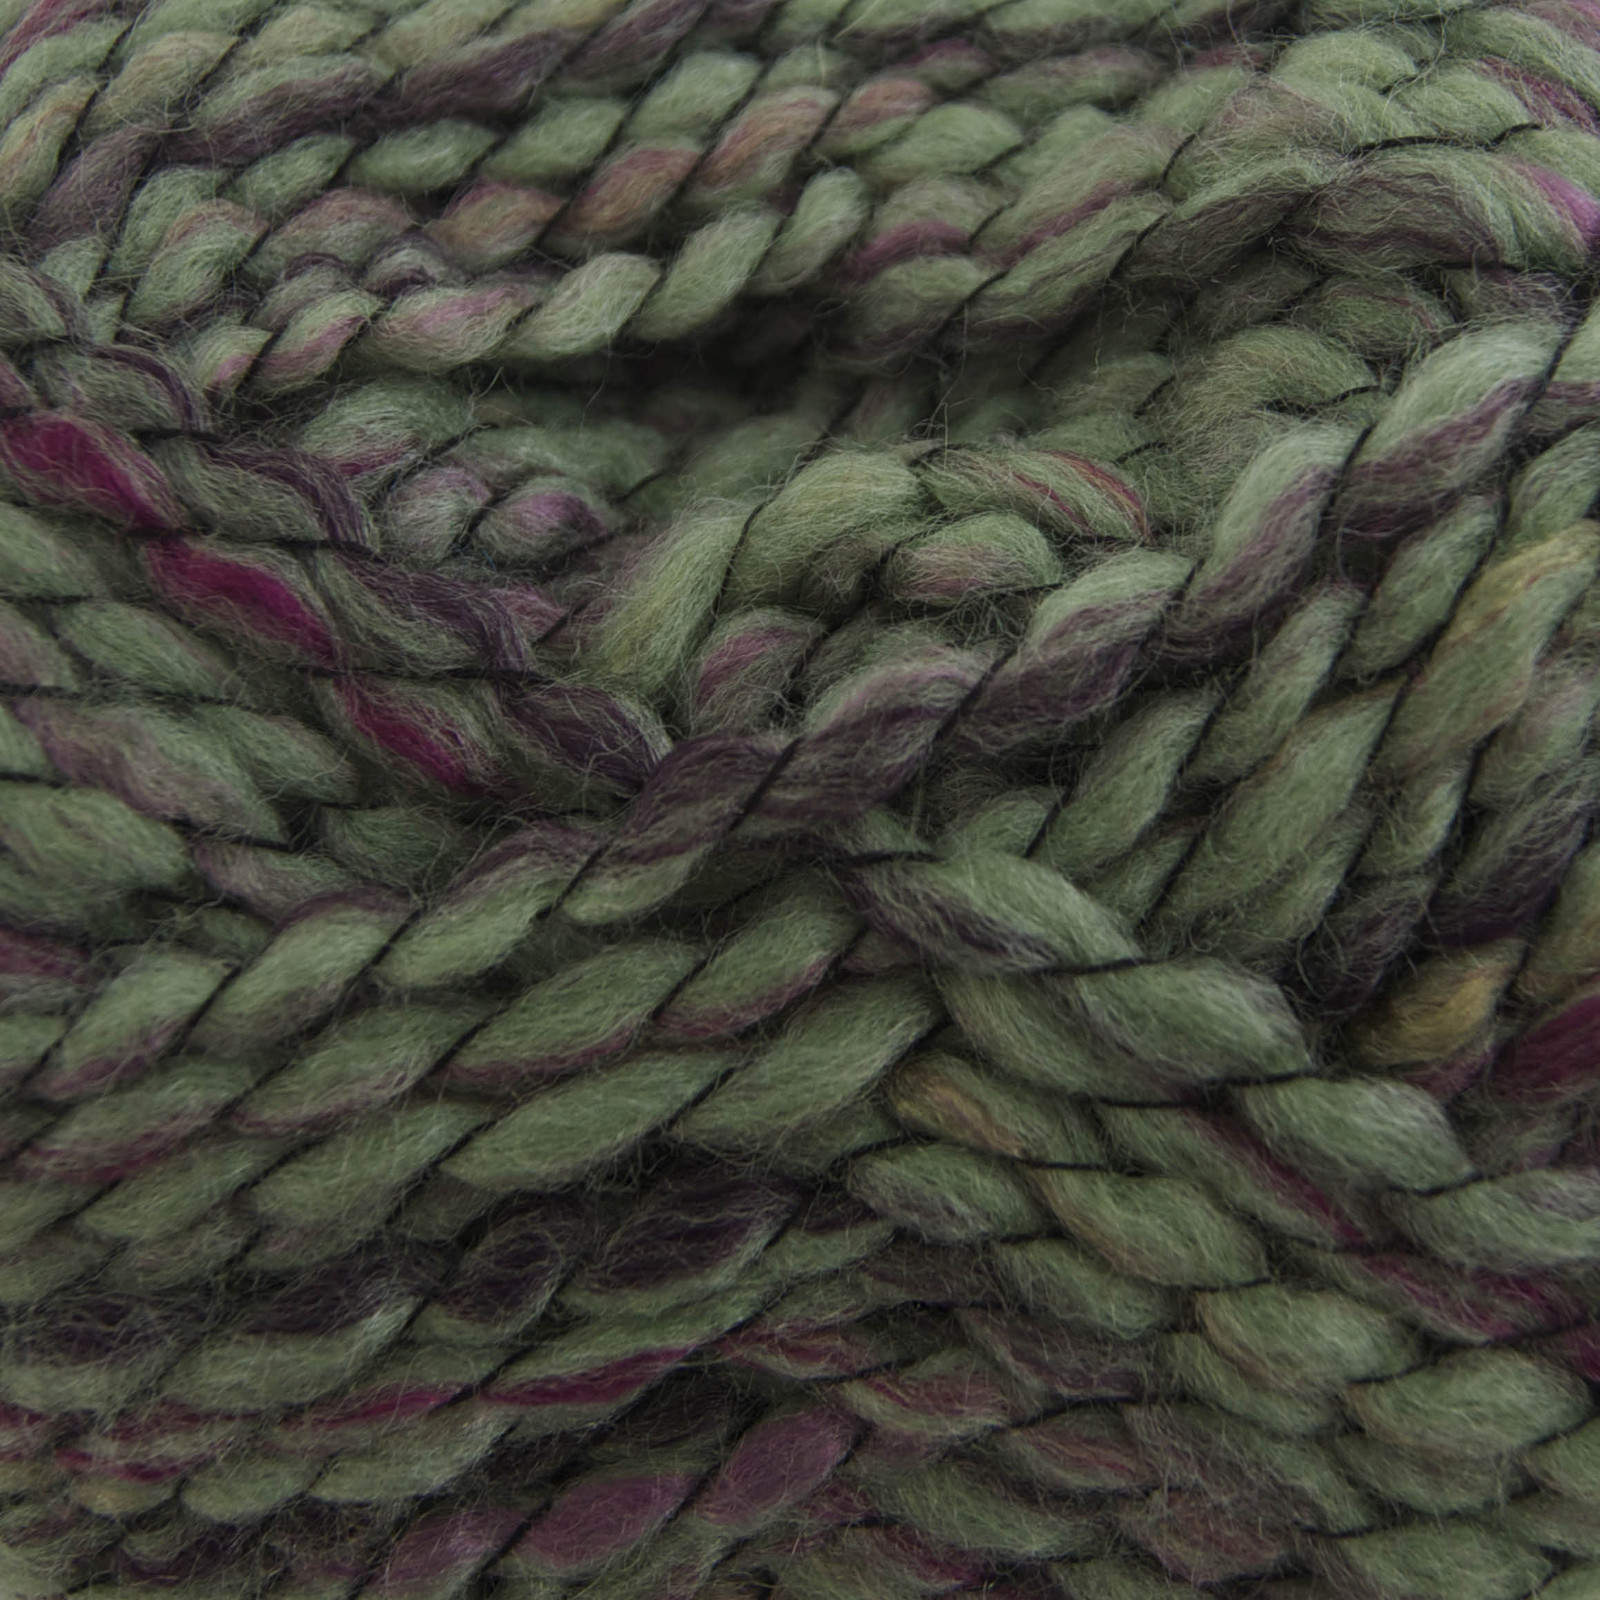 Chunky Knitting Wool Uk : King cole g ball gypsy super chunky knitting yarn soft